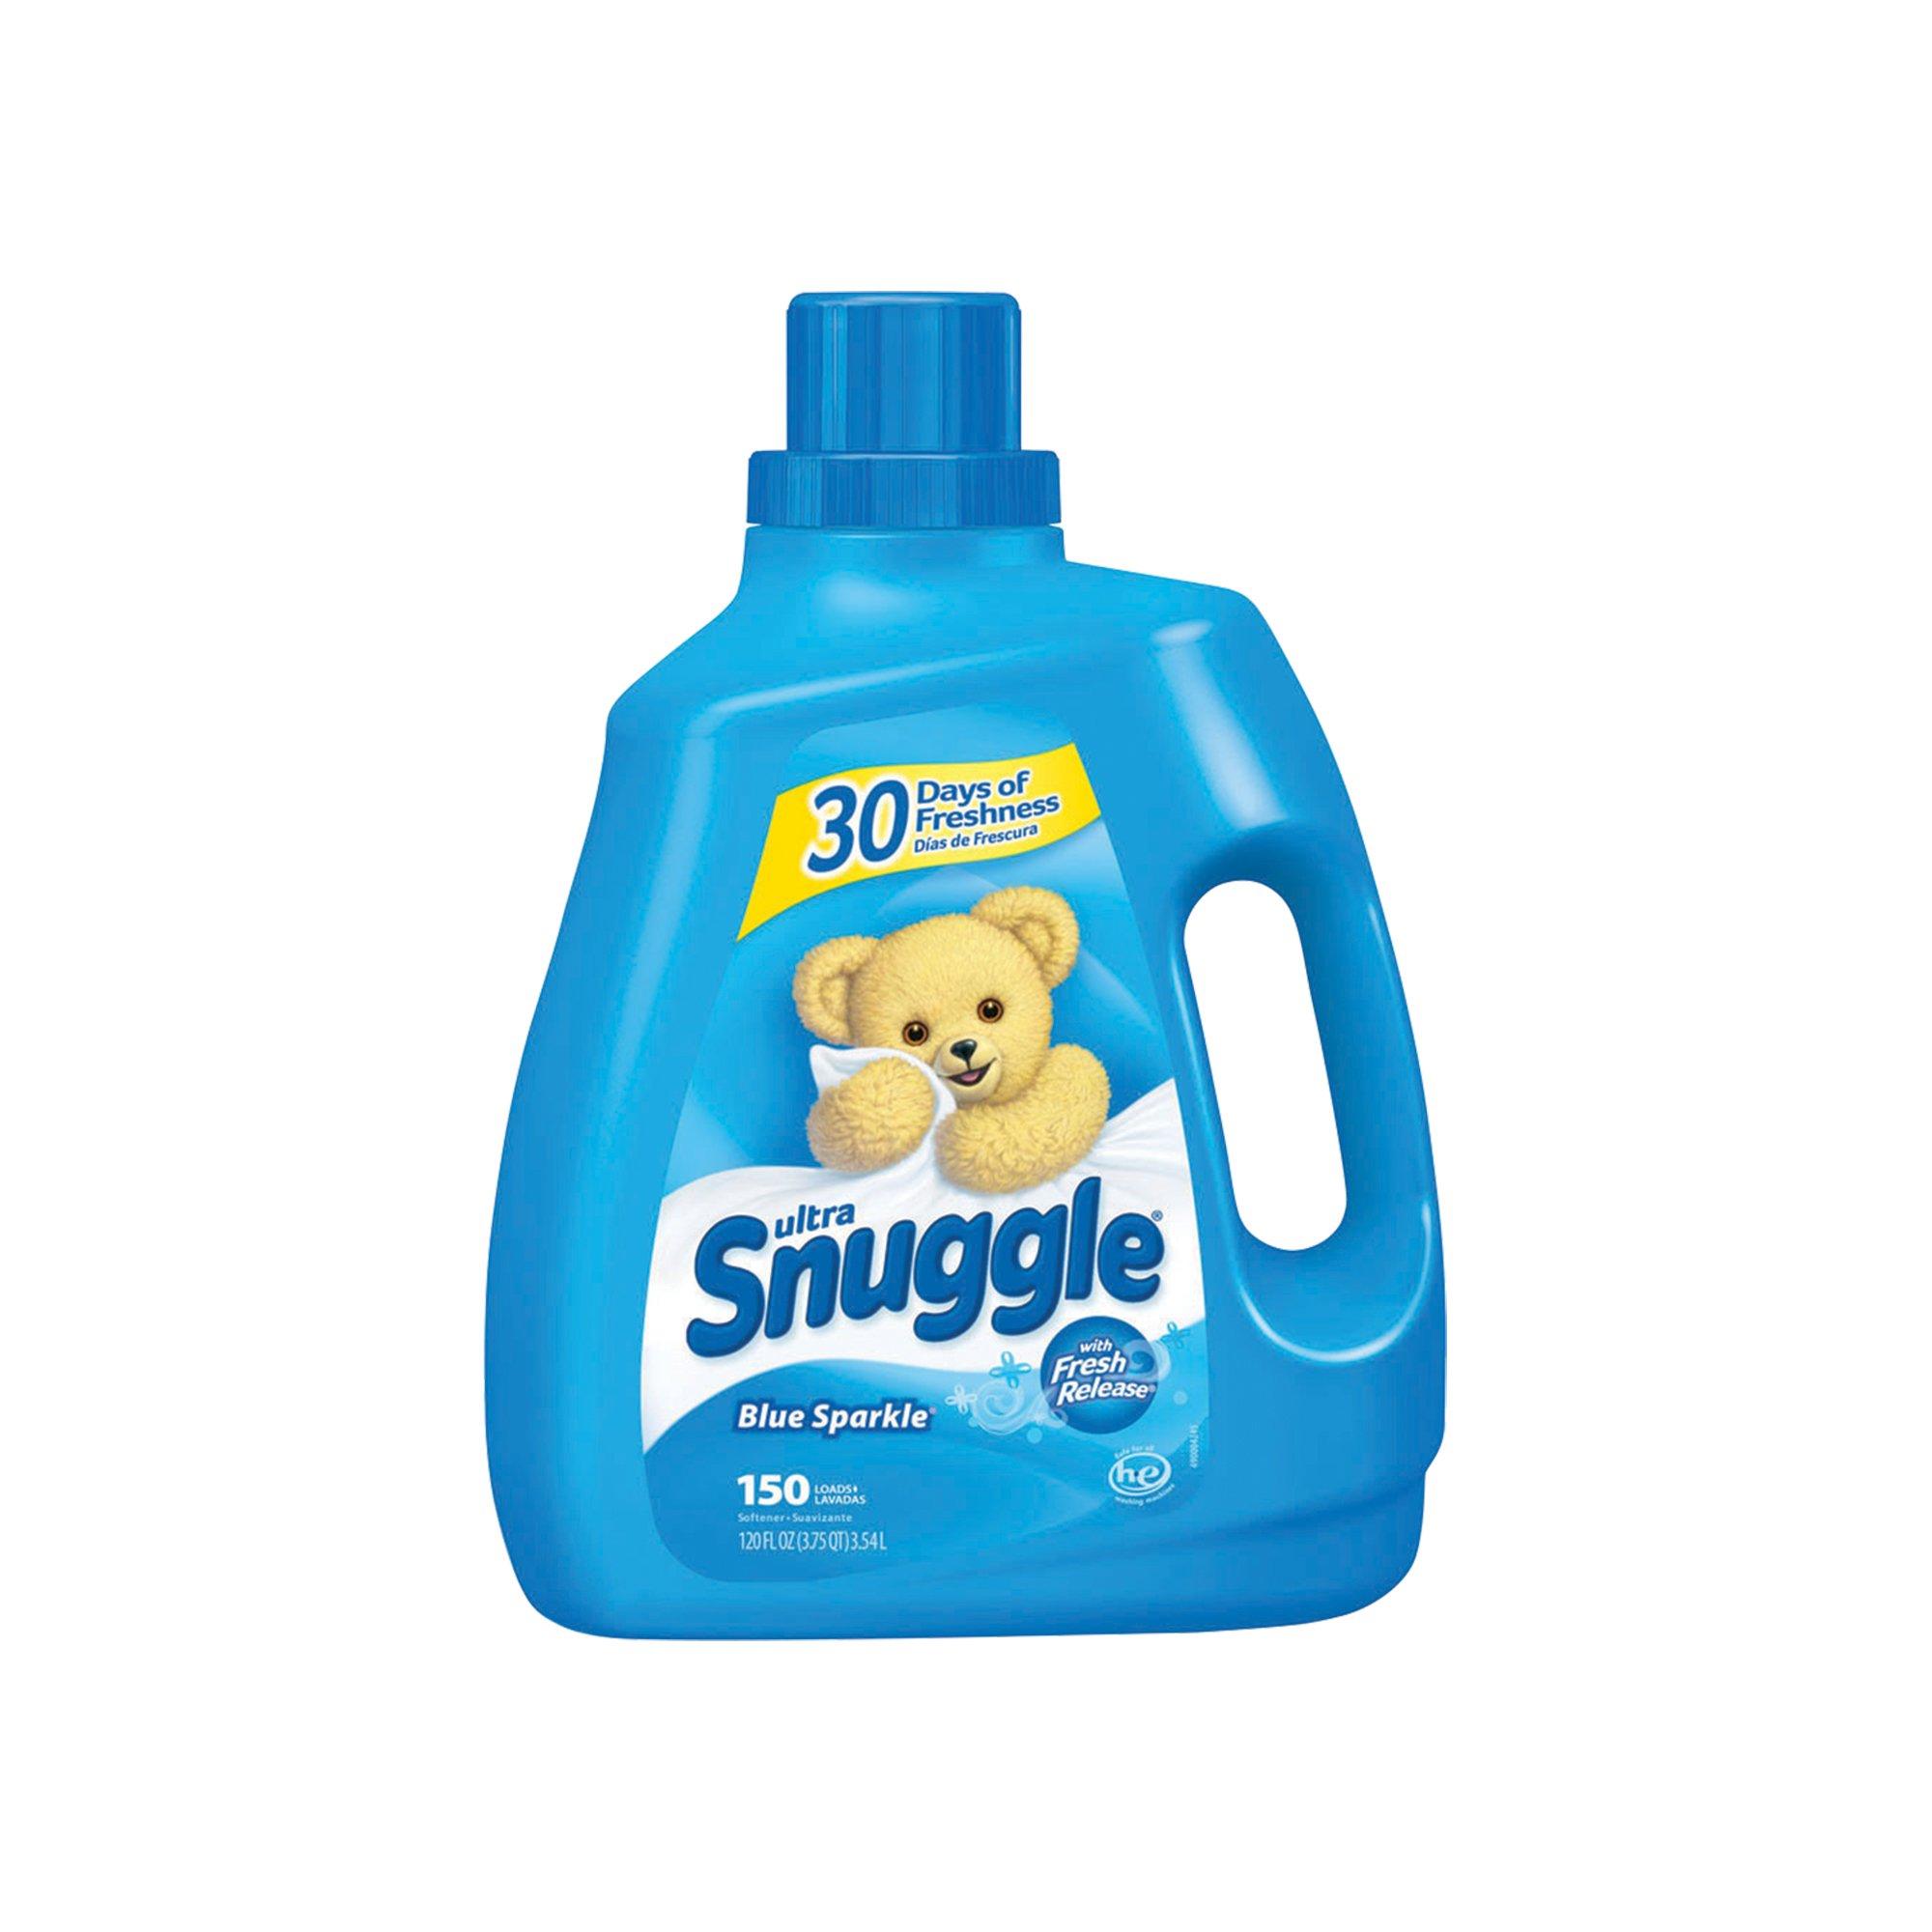 Diversey CB459794 Snuggle Liquid Fabric Softener Blue Sparkle 4 x 120 oz. (150 Loads per unit) (Pack of 4)